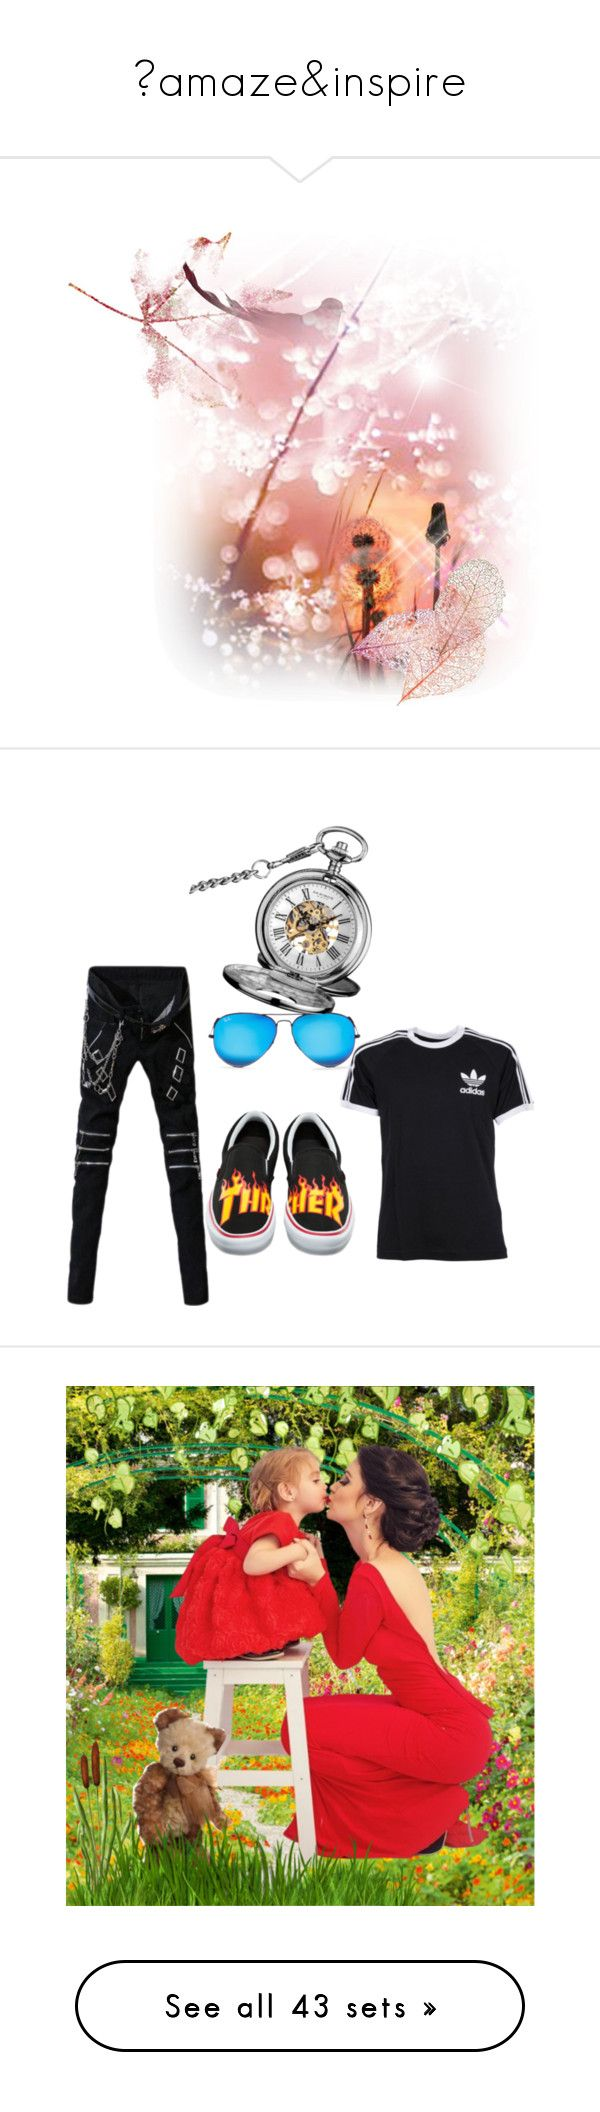 """💝amaze&inspire"" by lolla-cher ❤ liked on Polyvore featuring jojona, art, adidas, Vans, Ray-Ban, Akribos XXIV, men's fashion, menswear, summerwedding and Tory Burch"